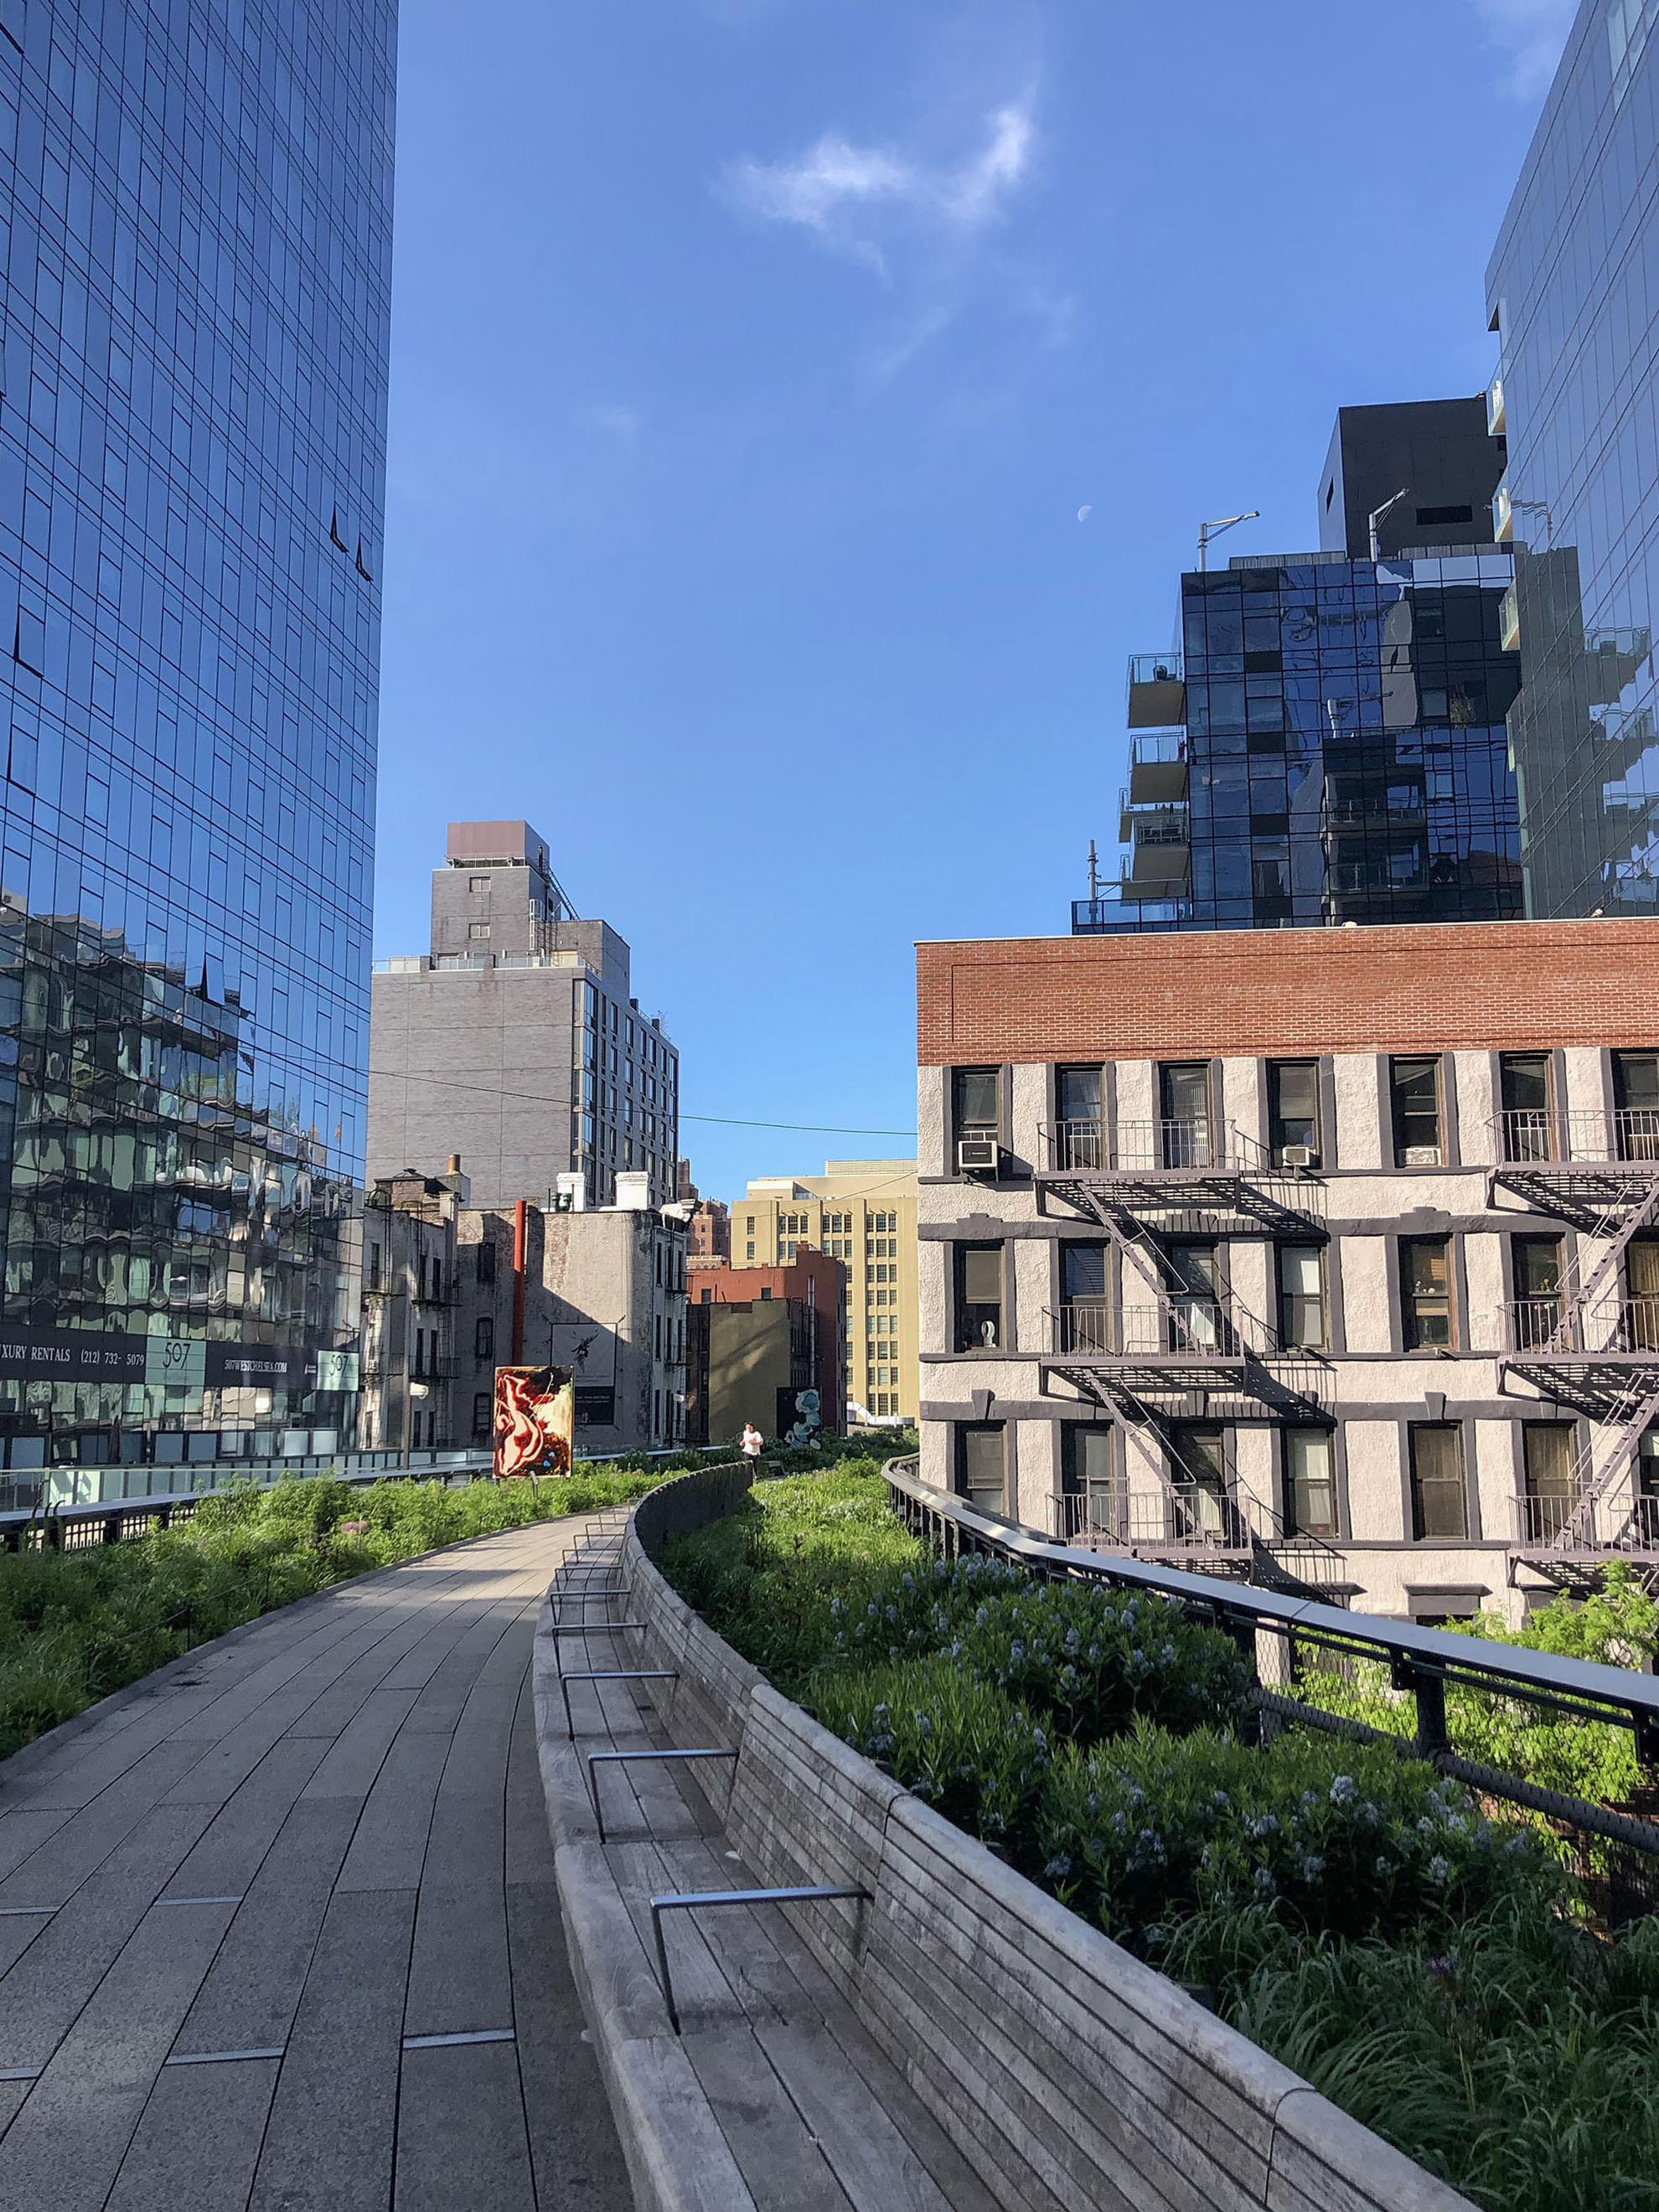 Vacay-NYC-High_Line_0173.jpg